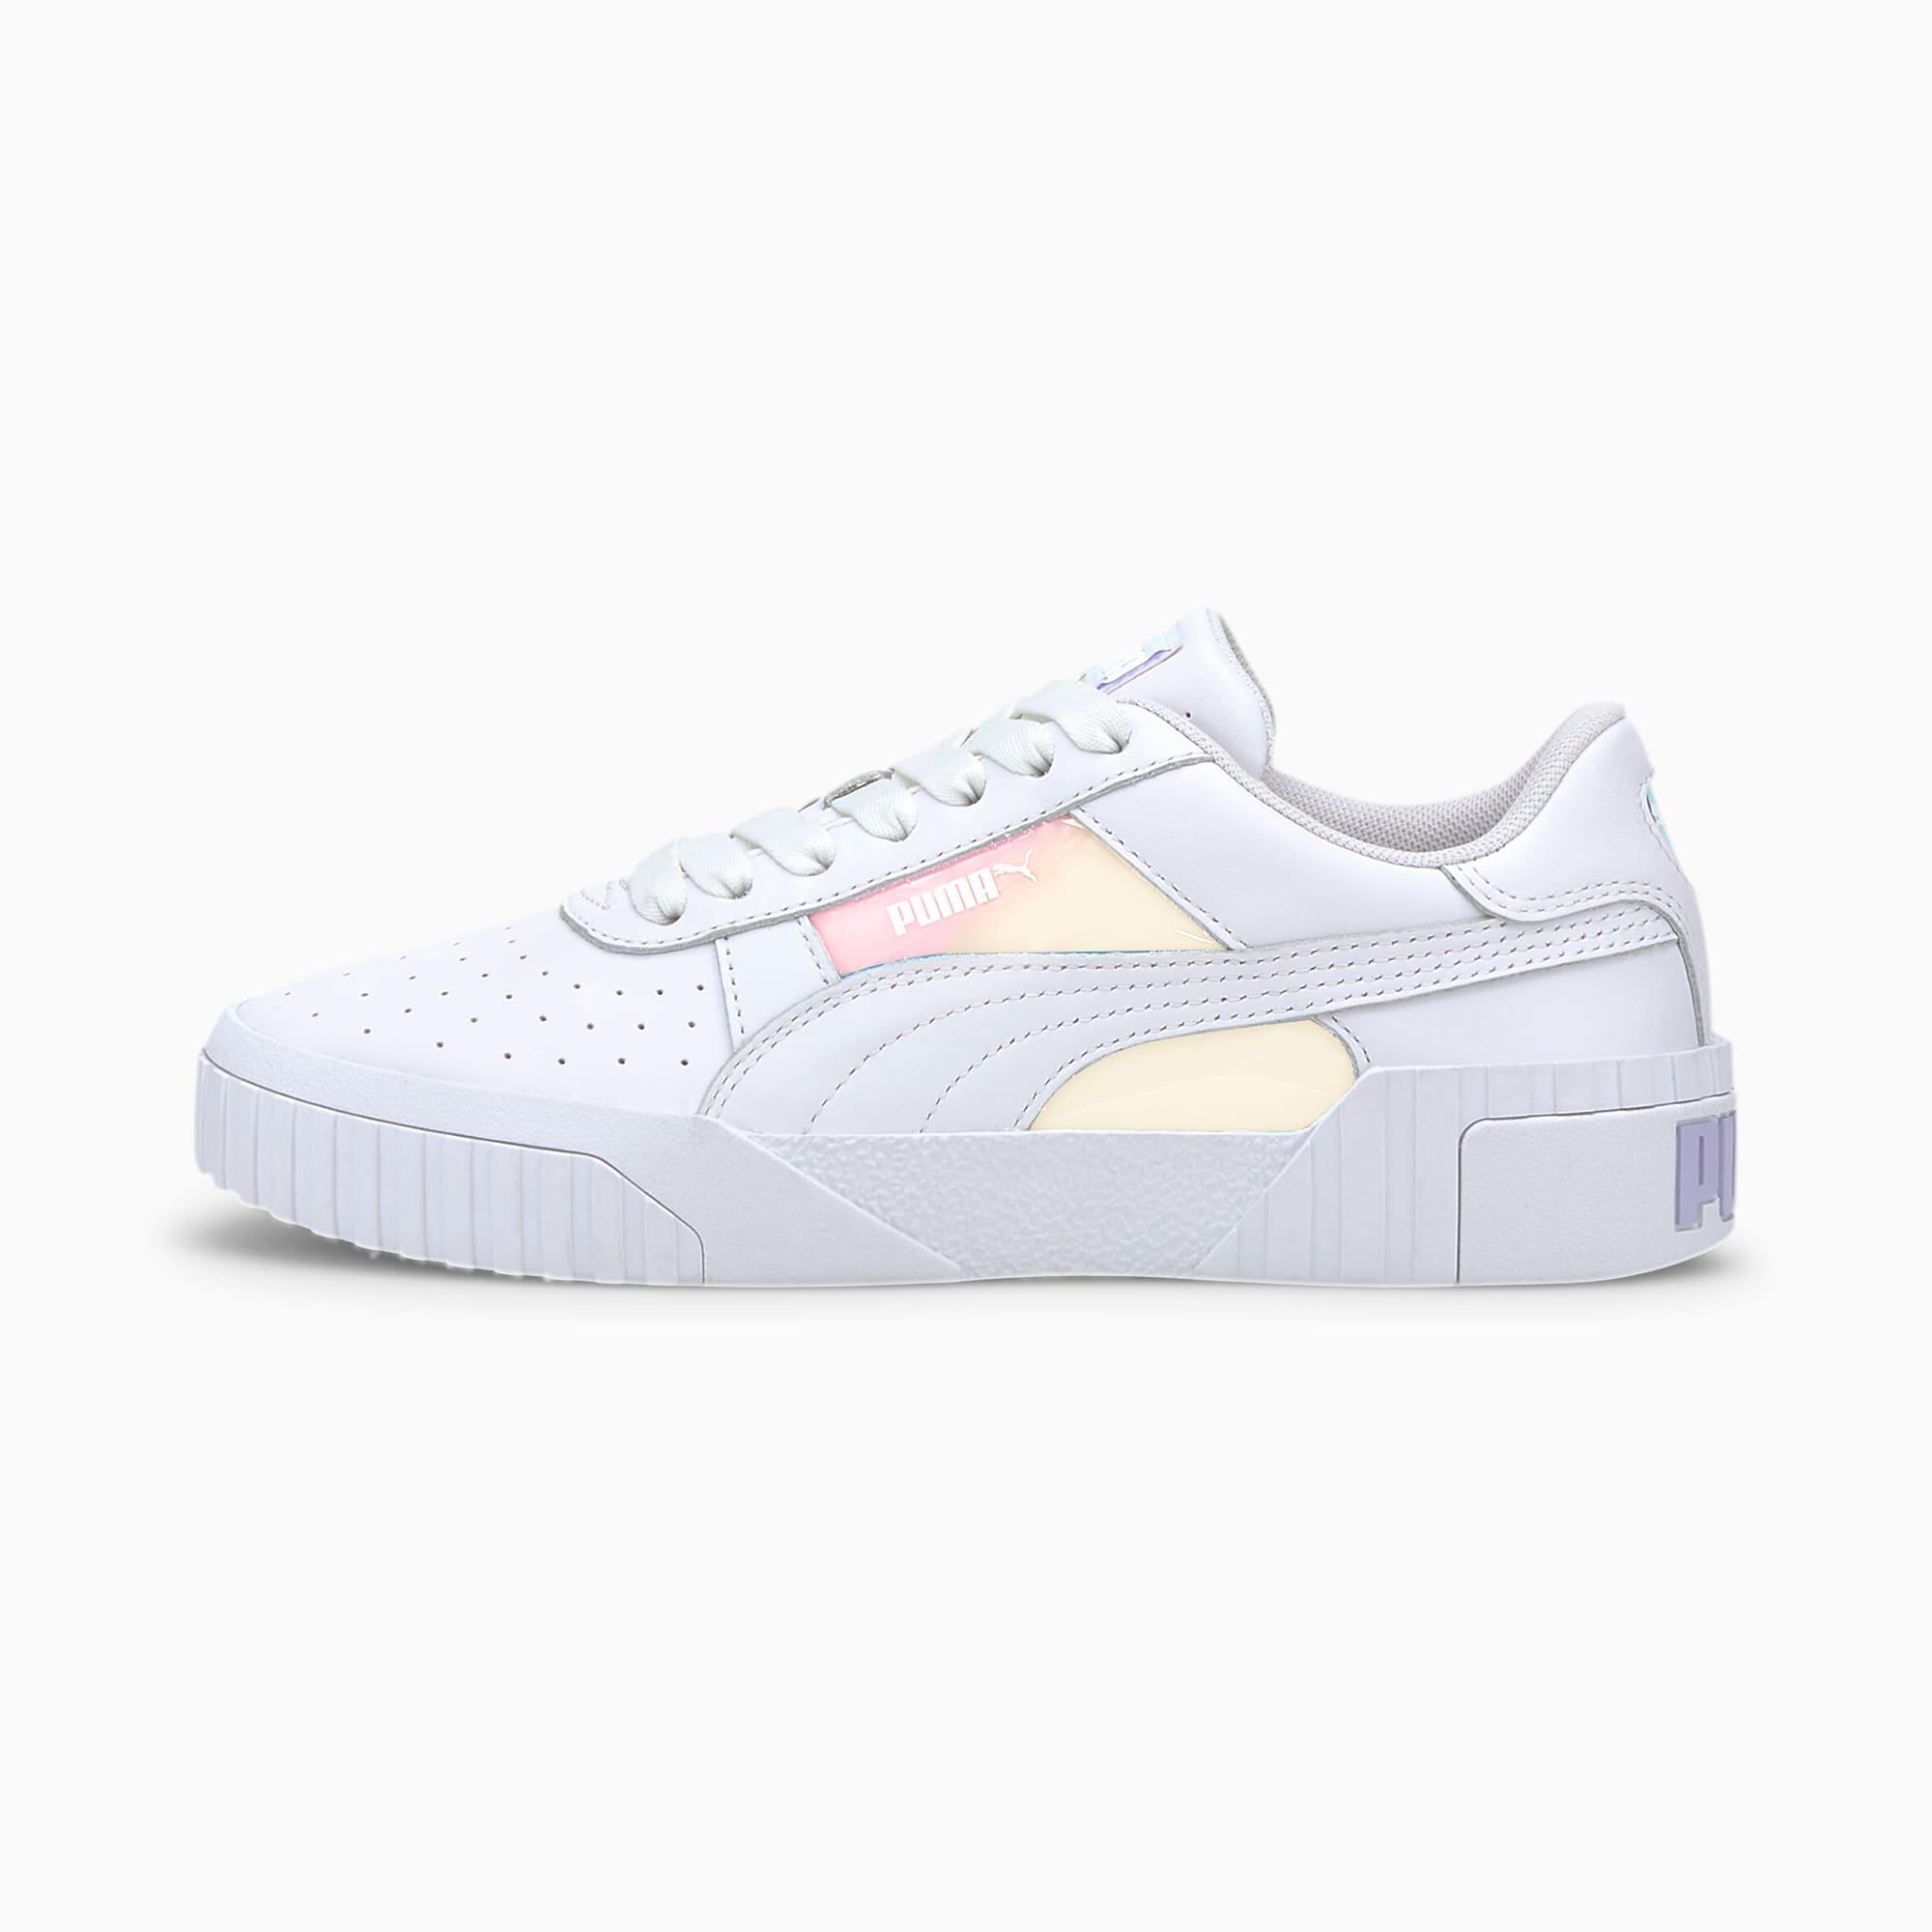 puma -  Cali Glow Damen Sneaker Schuhe | Weiß | Größe: 40.5